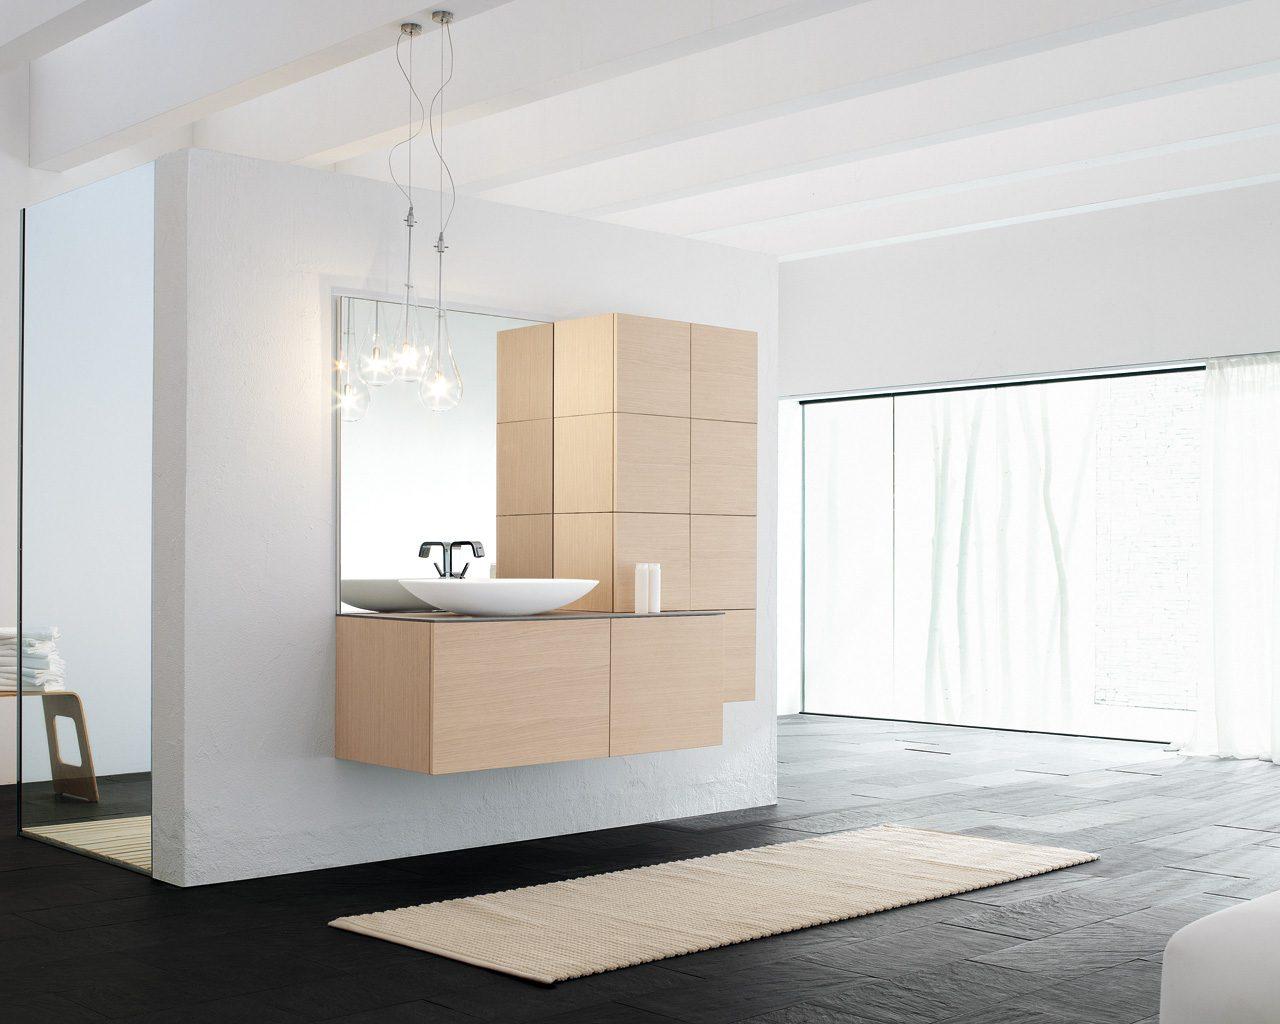 Baño Minimalista Gris:Banos minimalistas5